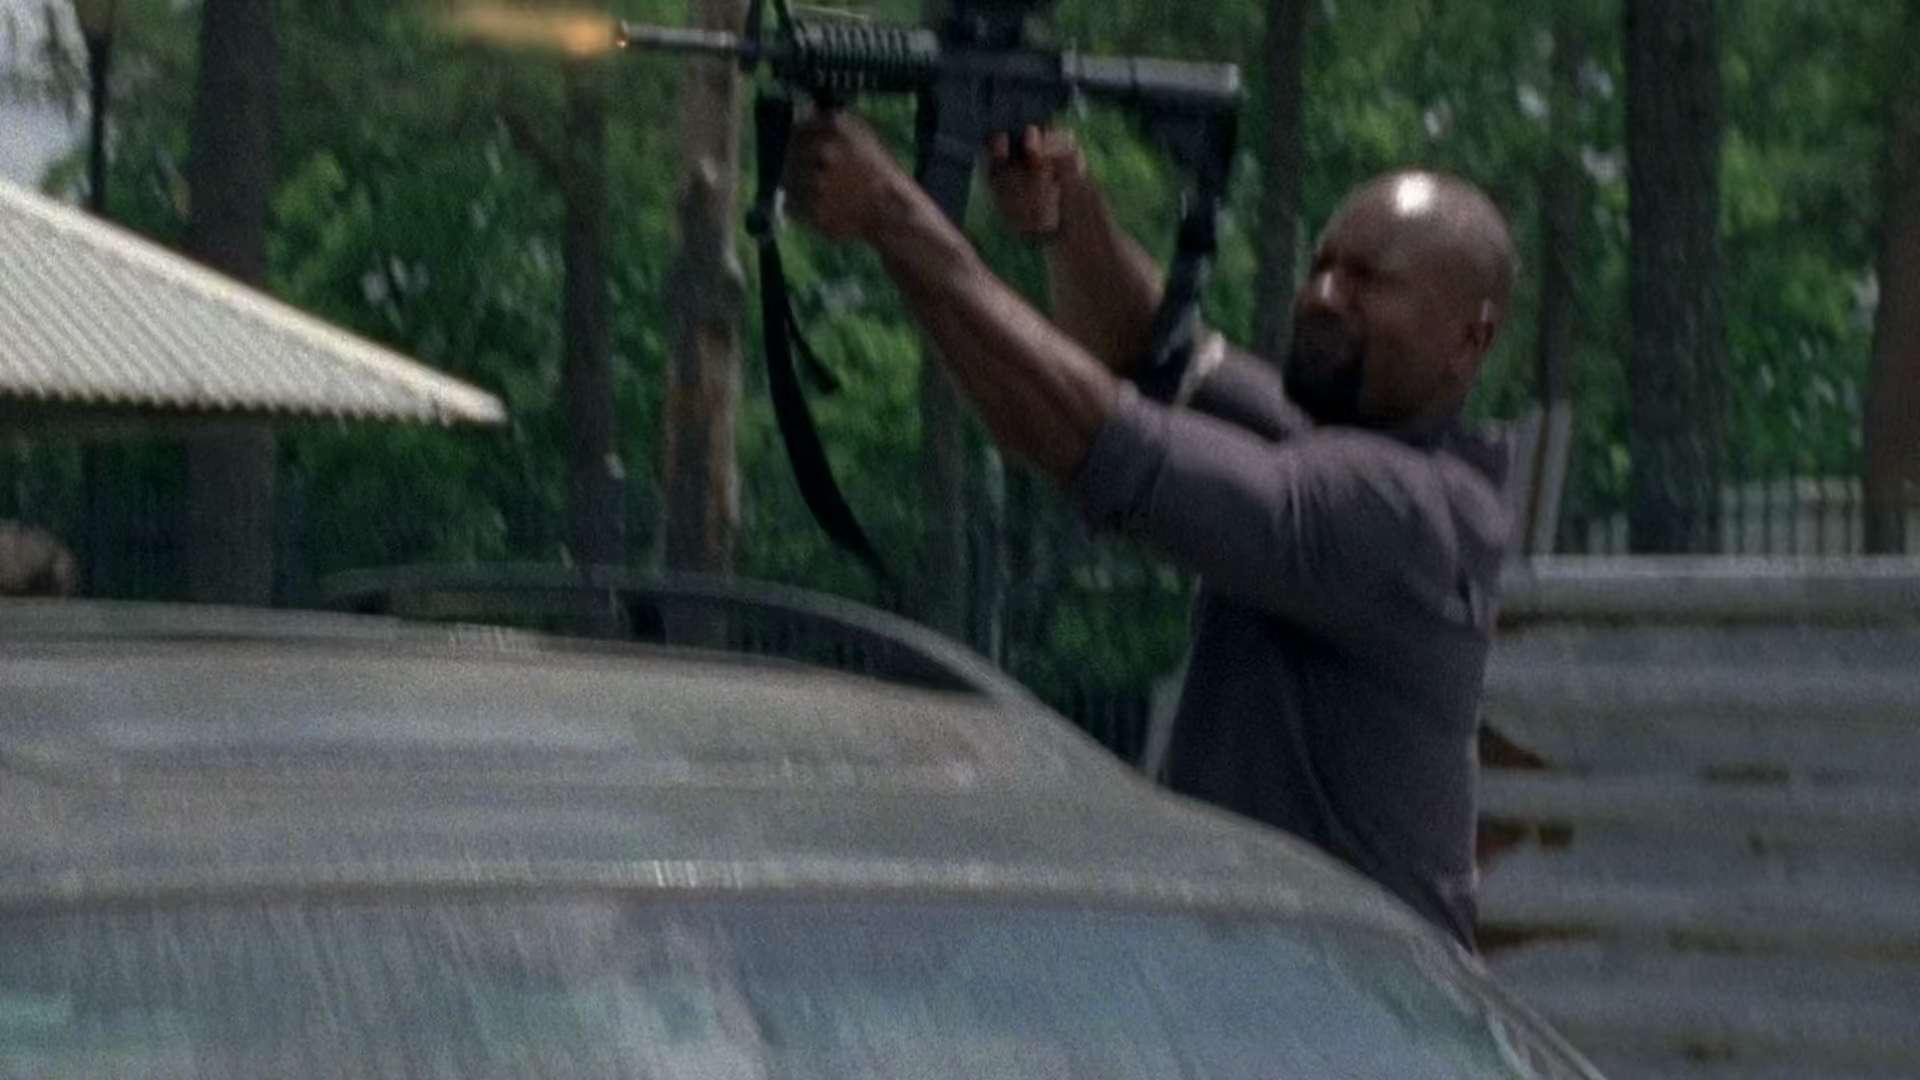 The Walking Dead S08E02 The Damned 1080p 10bit AMZN WEB-DL DDP5 1 x265 HEVC-MZABI